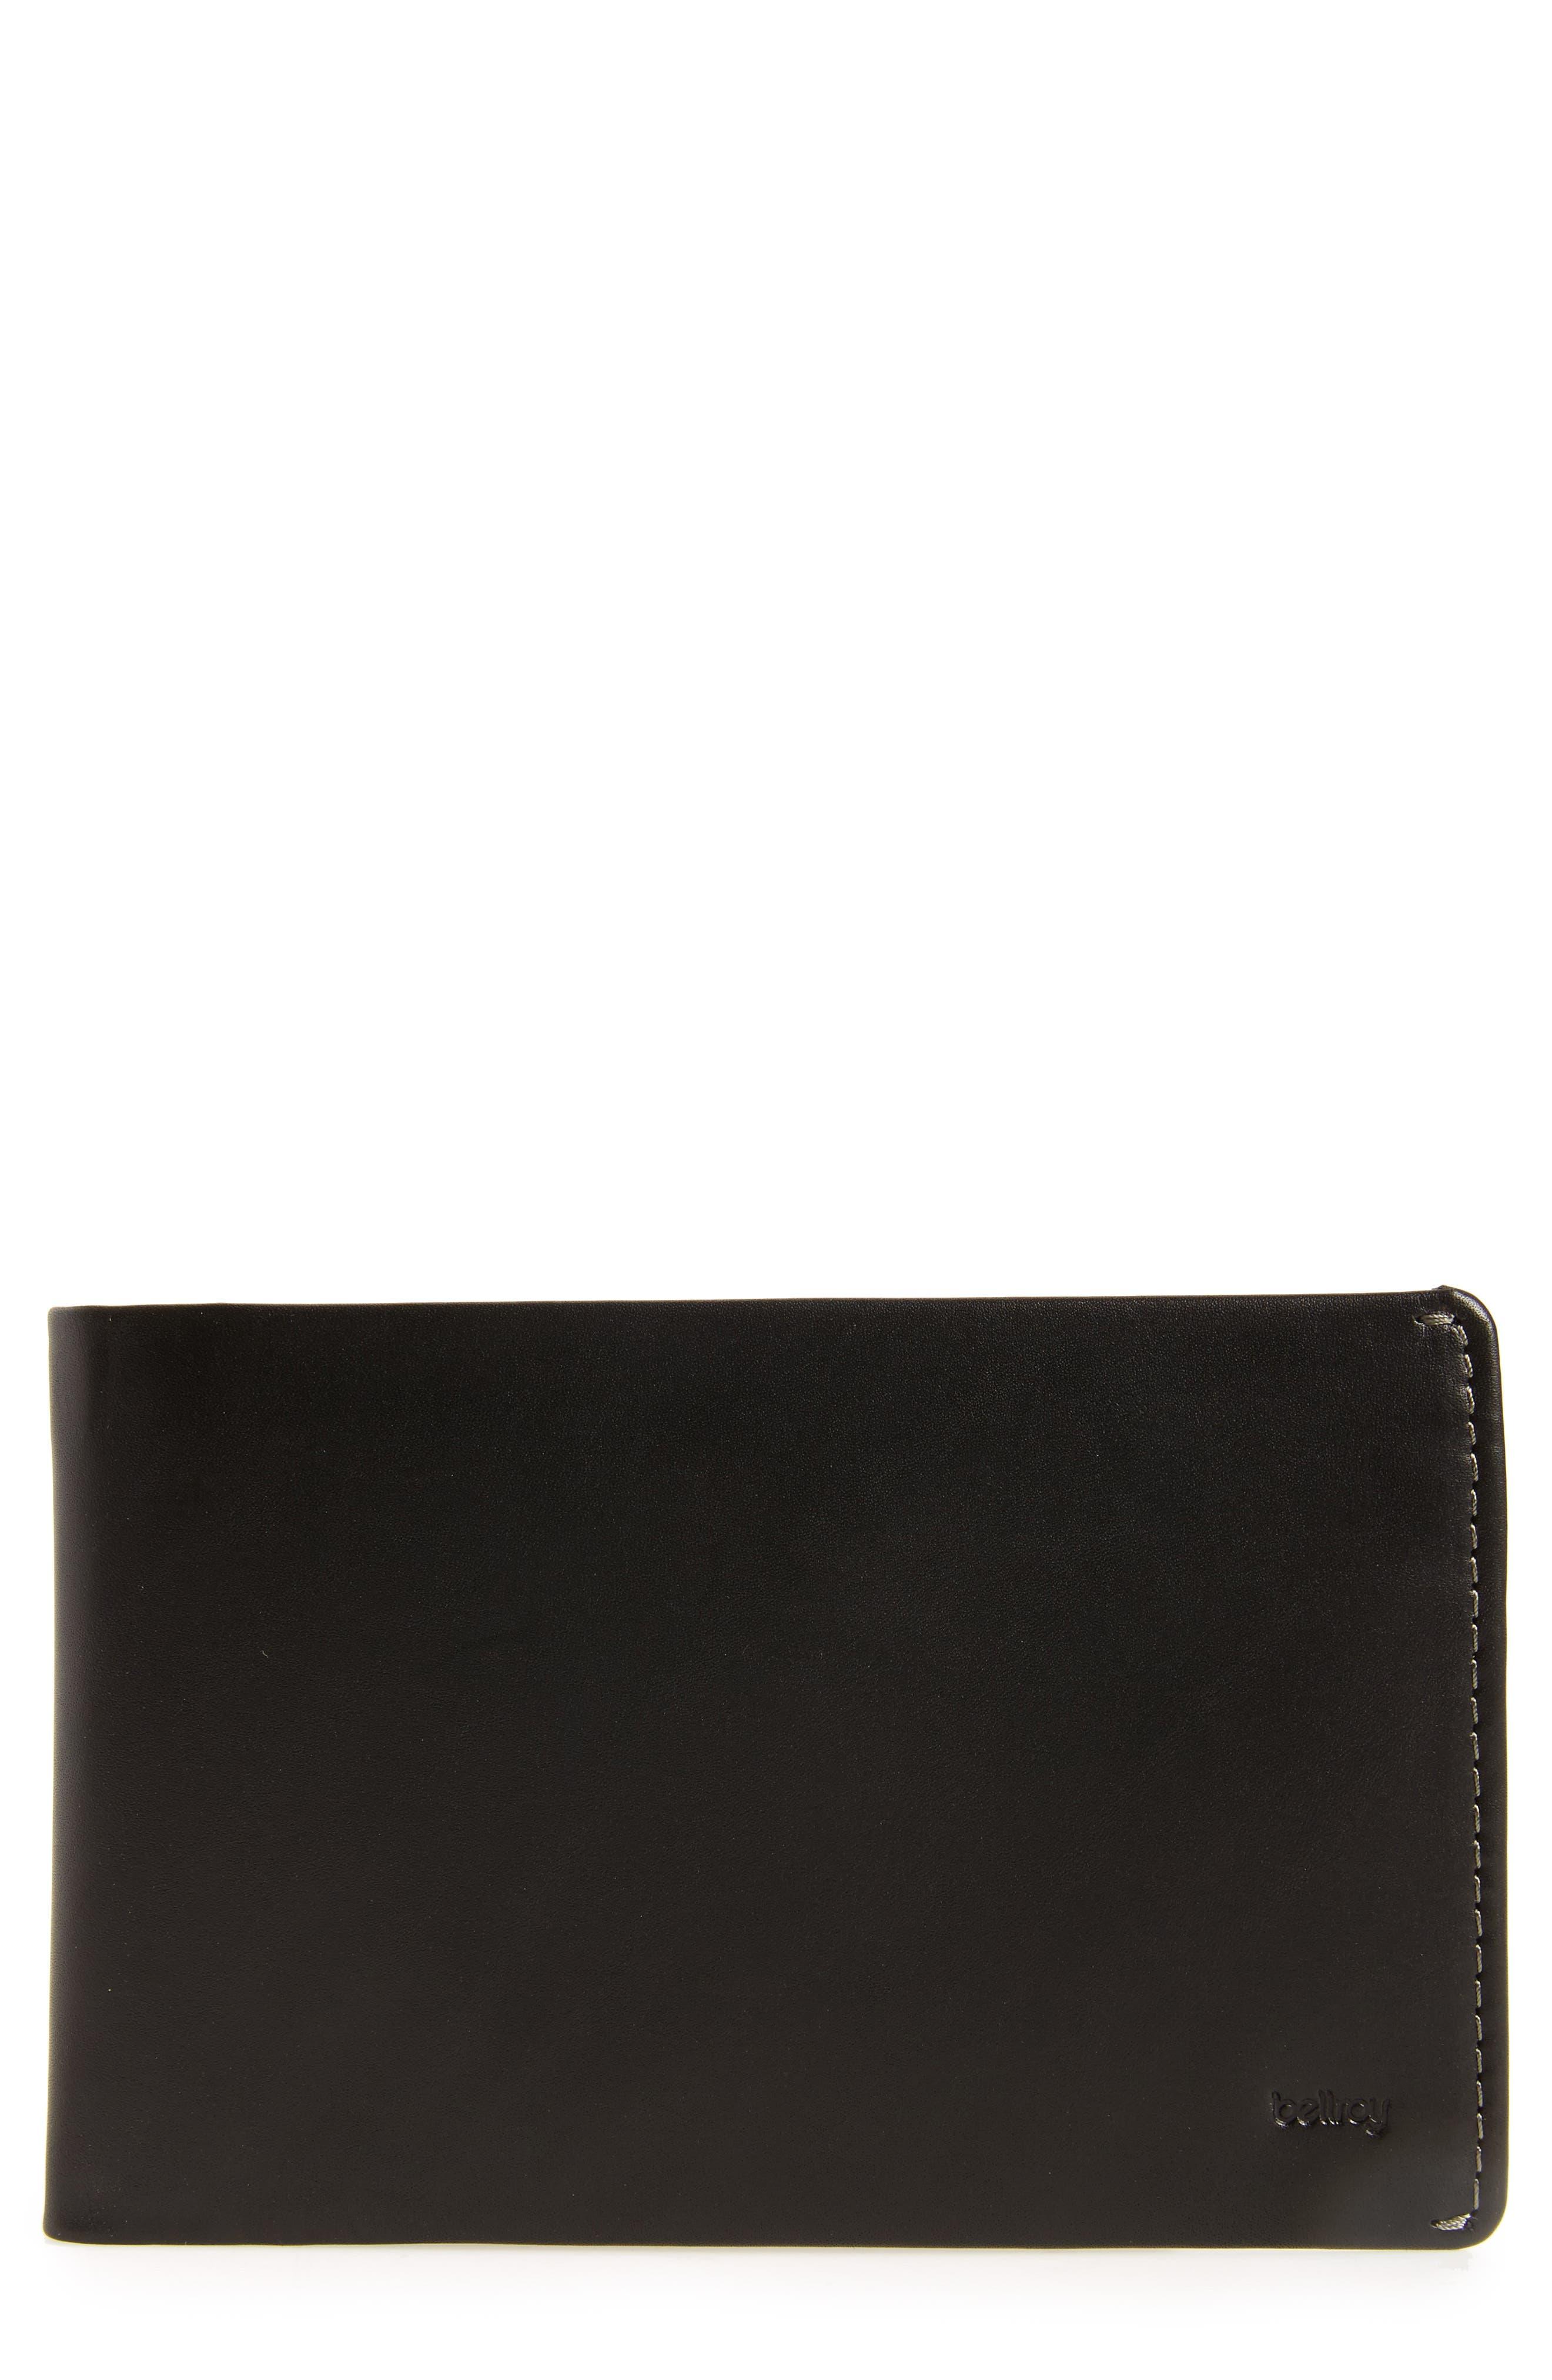 Bellroy RFID Travel Wallet